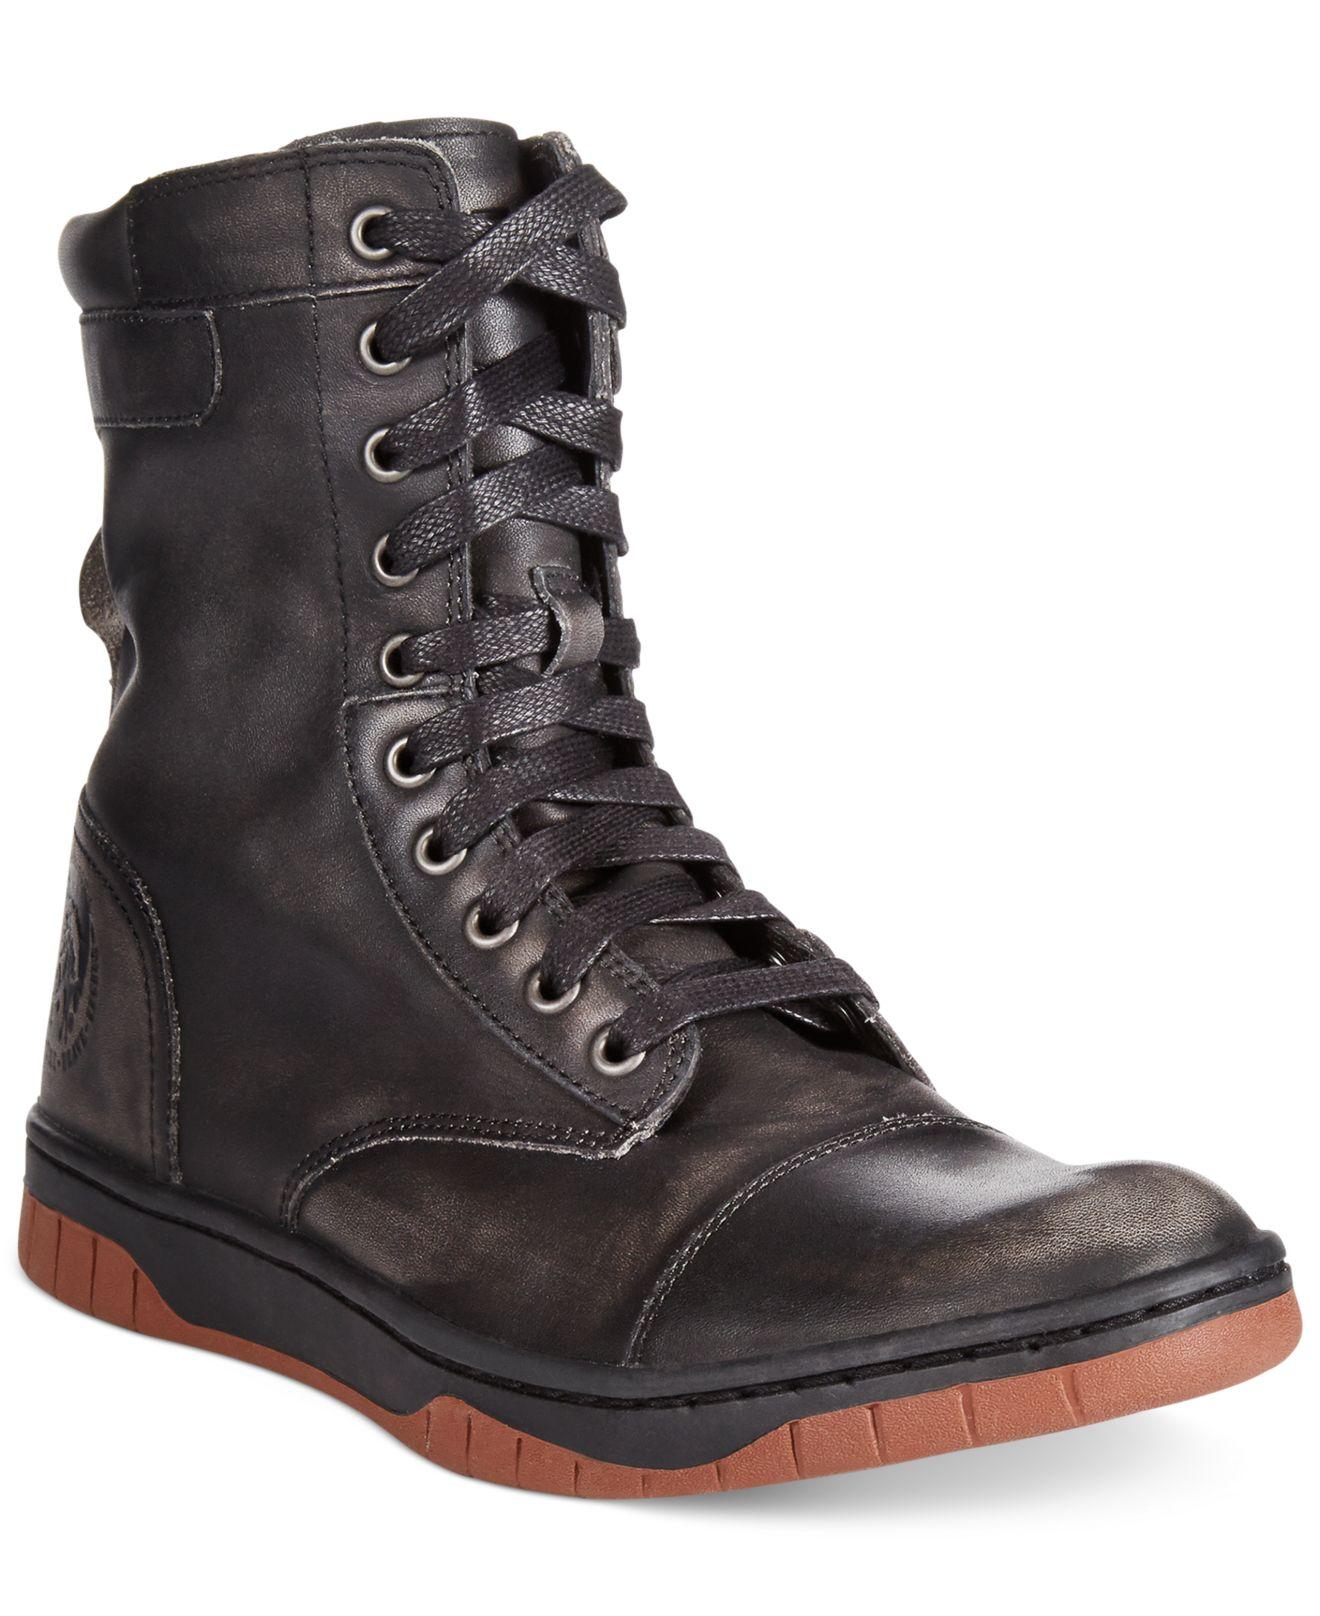 Diesel Tatradium Basket Butch Zip Boots In Black For Men